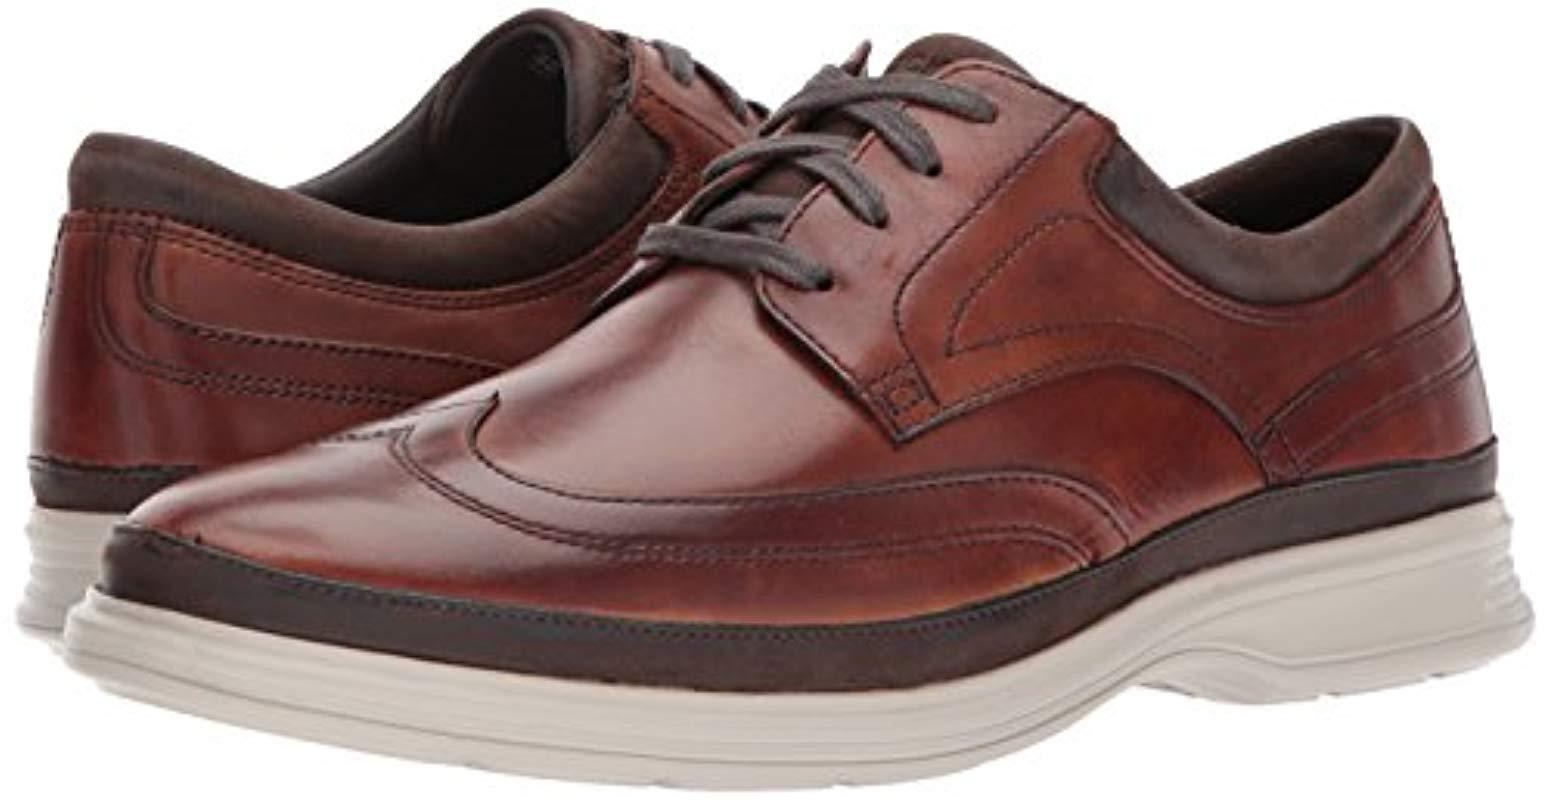 Rockport Dressports 2 Lite Wingtip Shoe